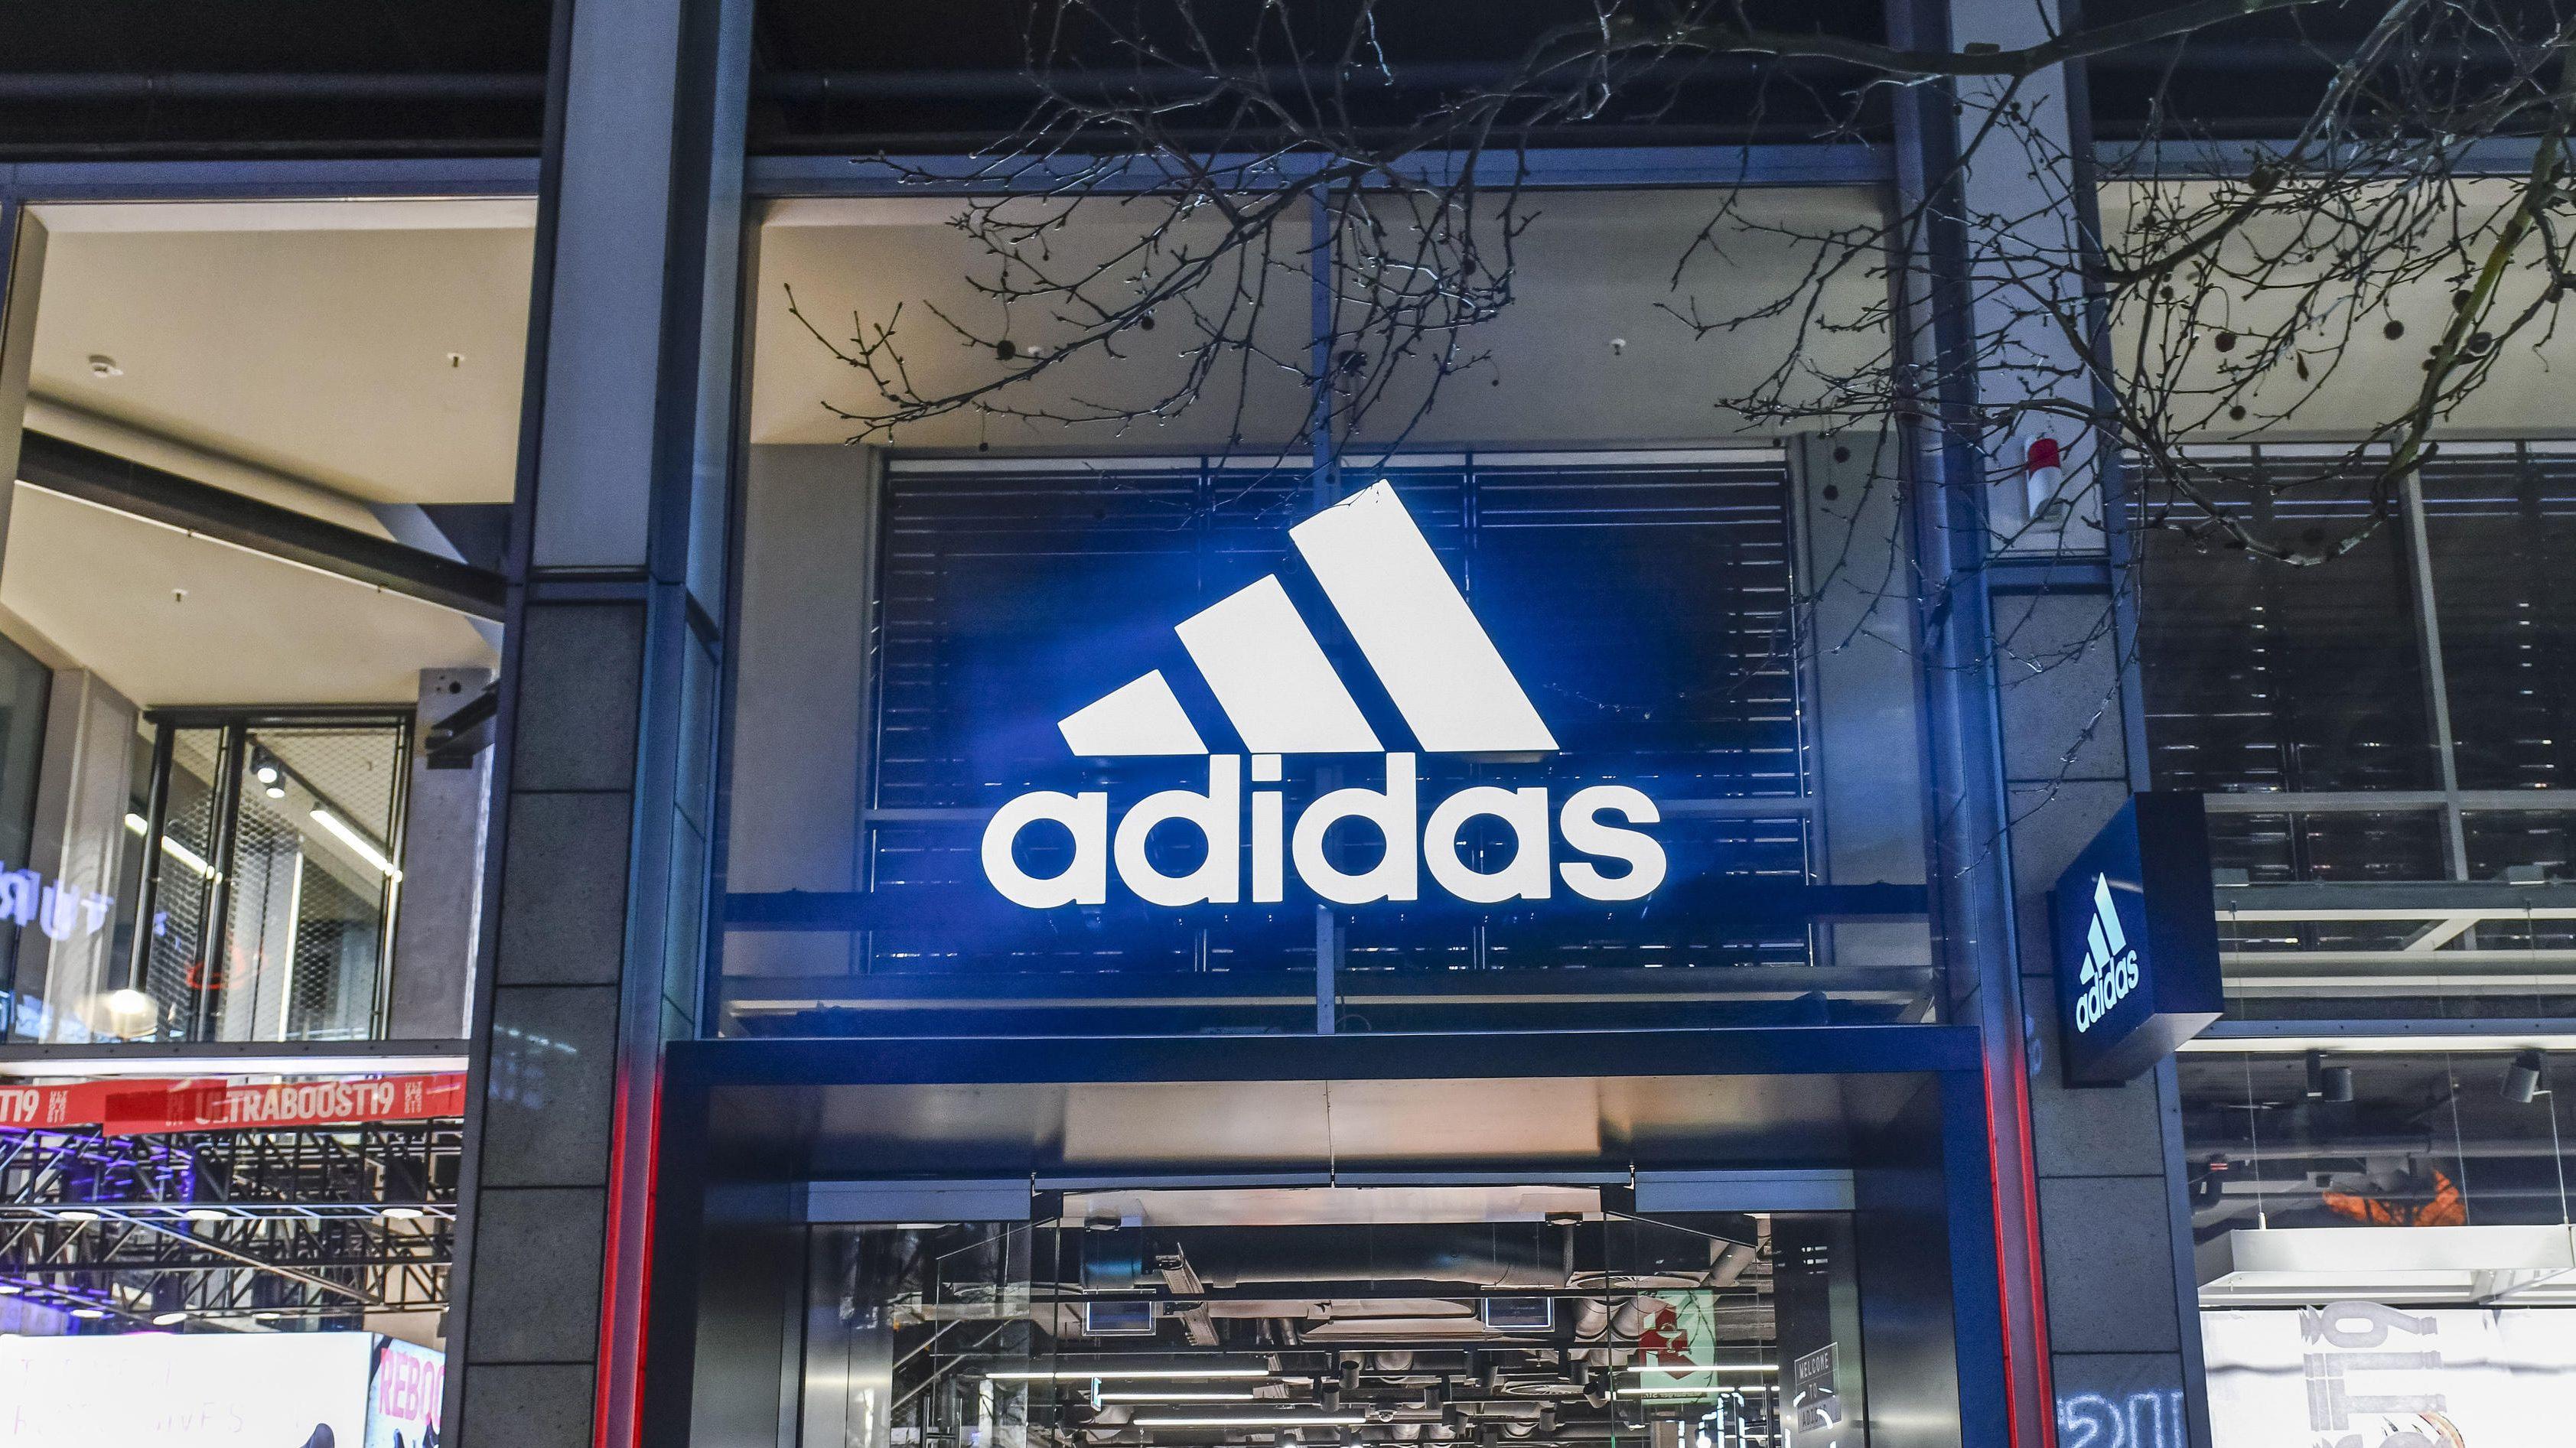 Eingang eines Adidas-Shops in Berlin